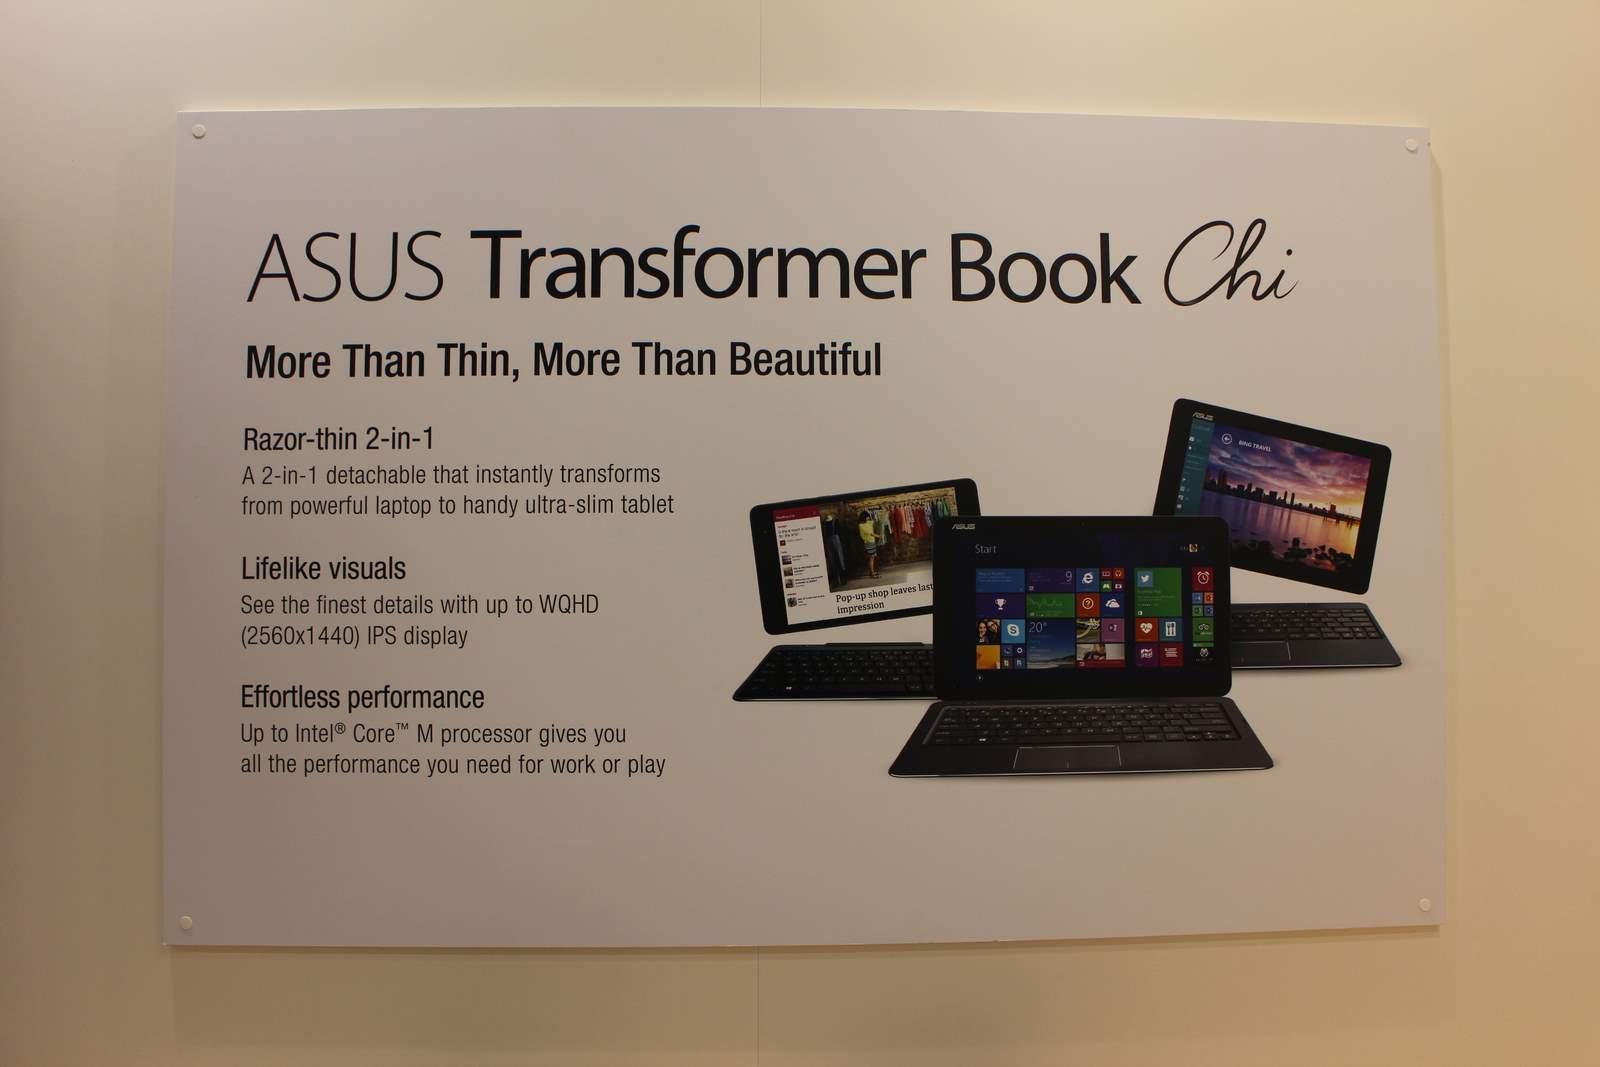 [MWC 2015] Asus Transformer Book Chi, 3 modèles transformables sous Windows 8.1